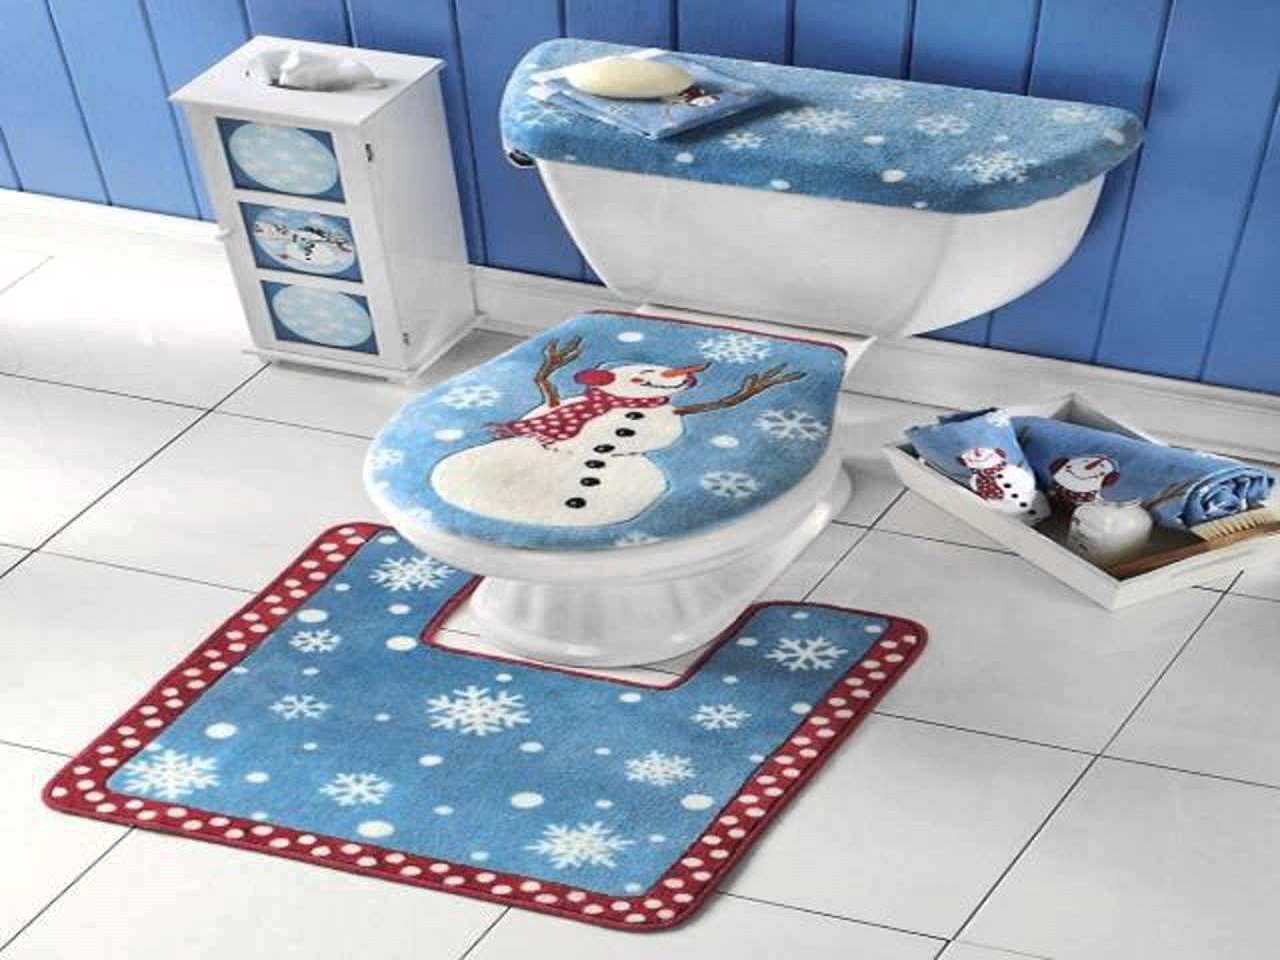 Bathroom Rugs And Toilet Seat Covers Ideas Pinterest Bathroom - Christmas bathroom decor sets